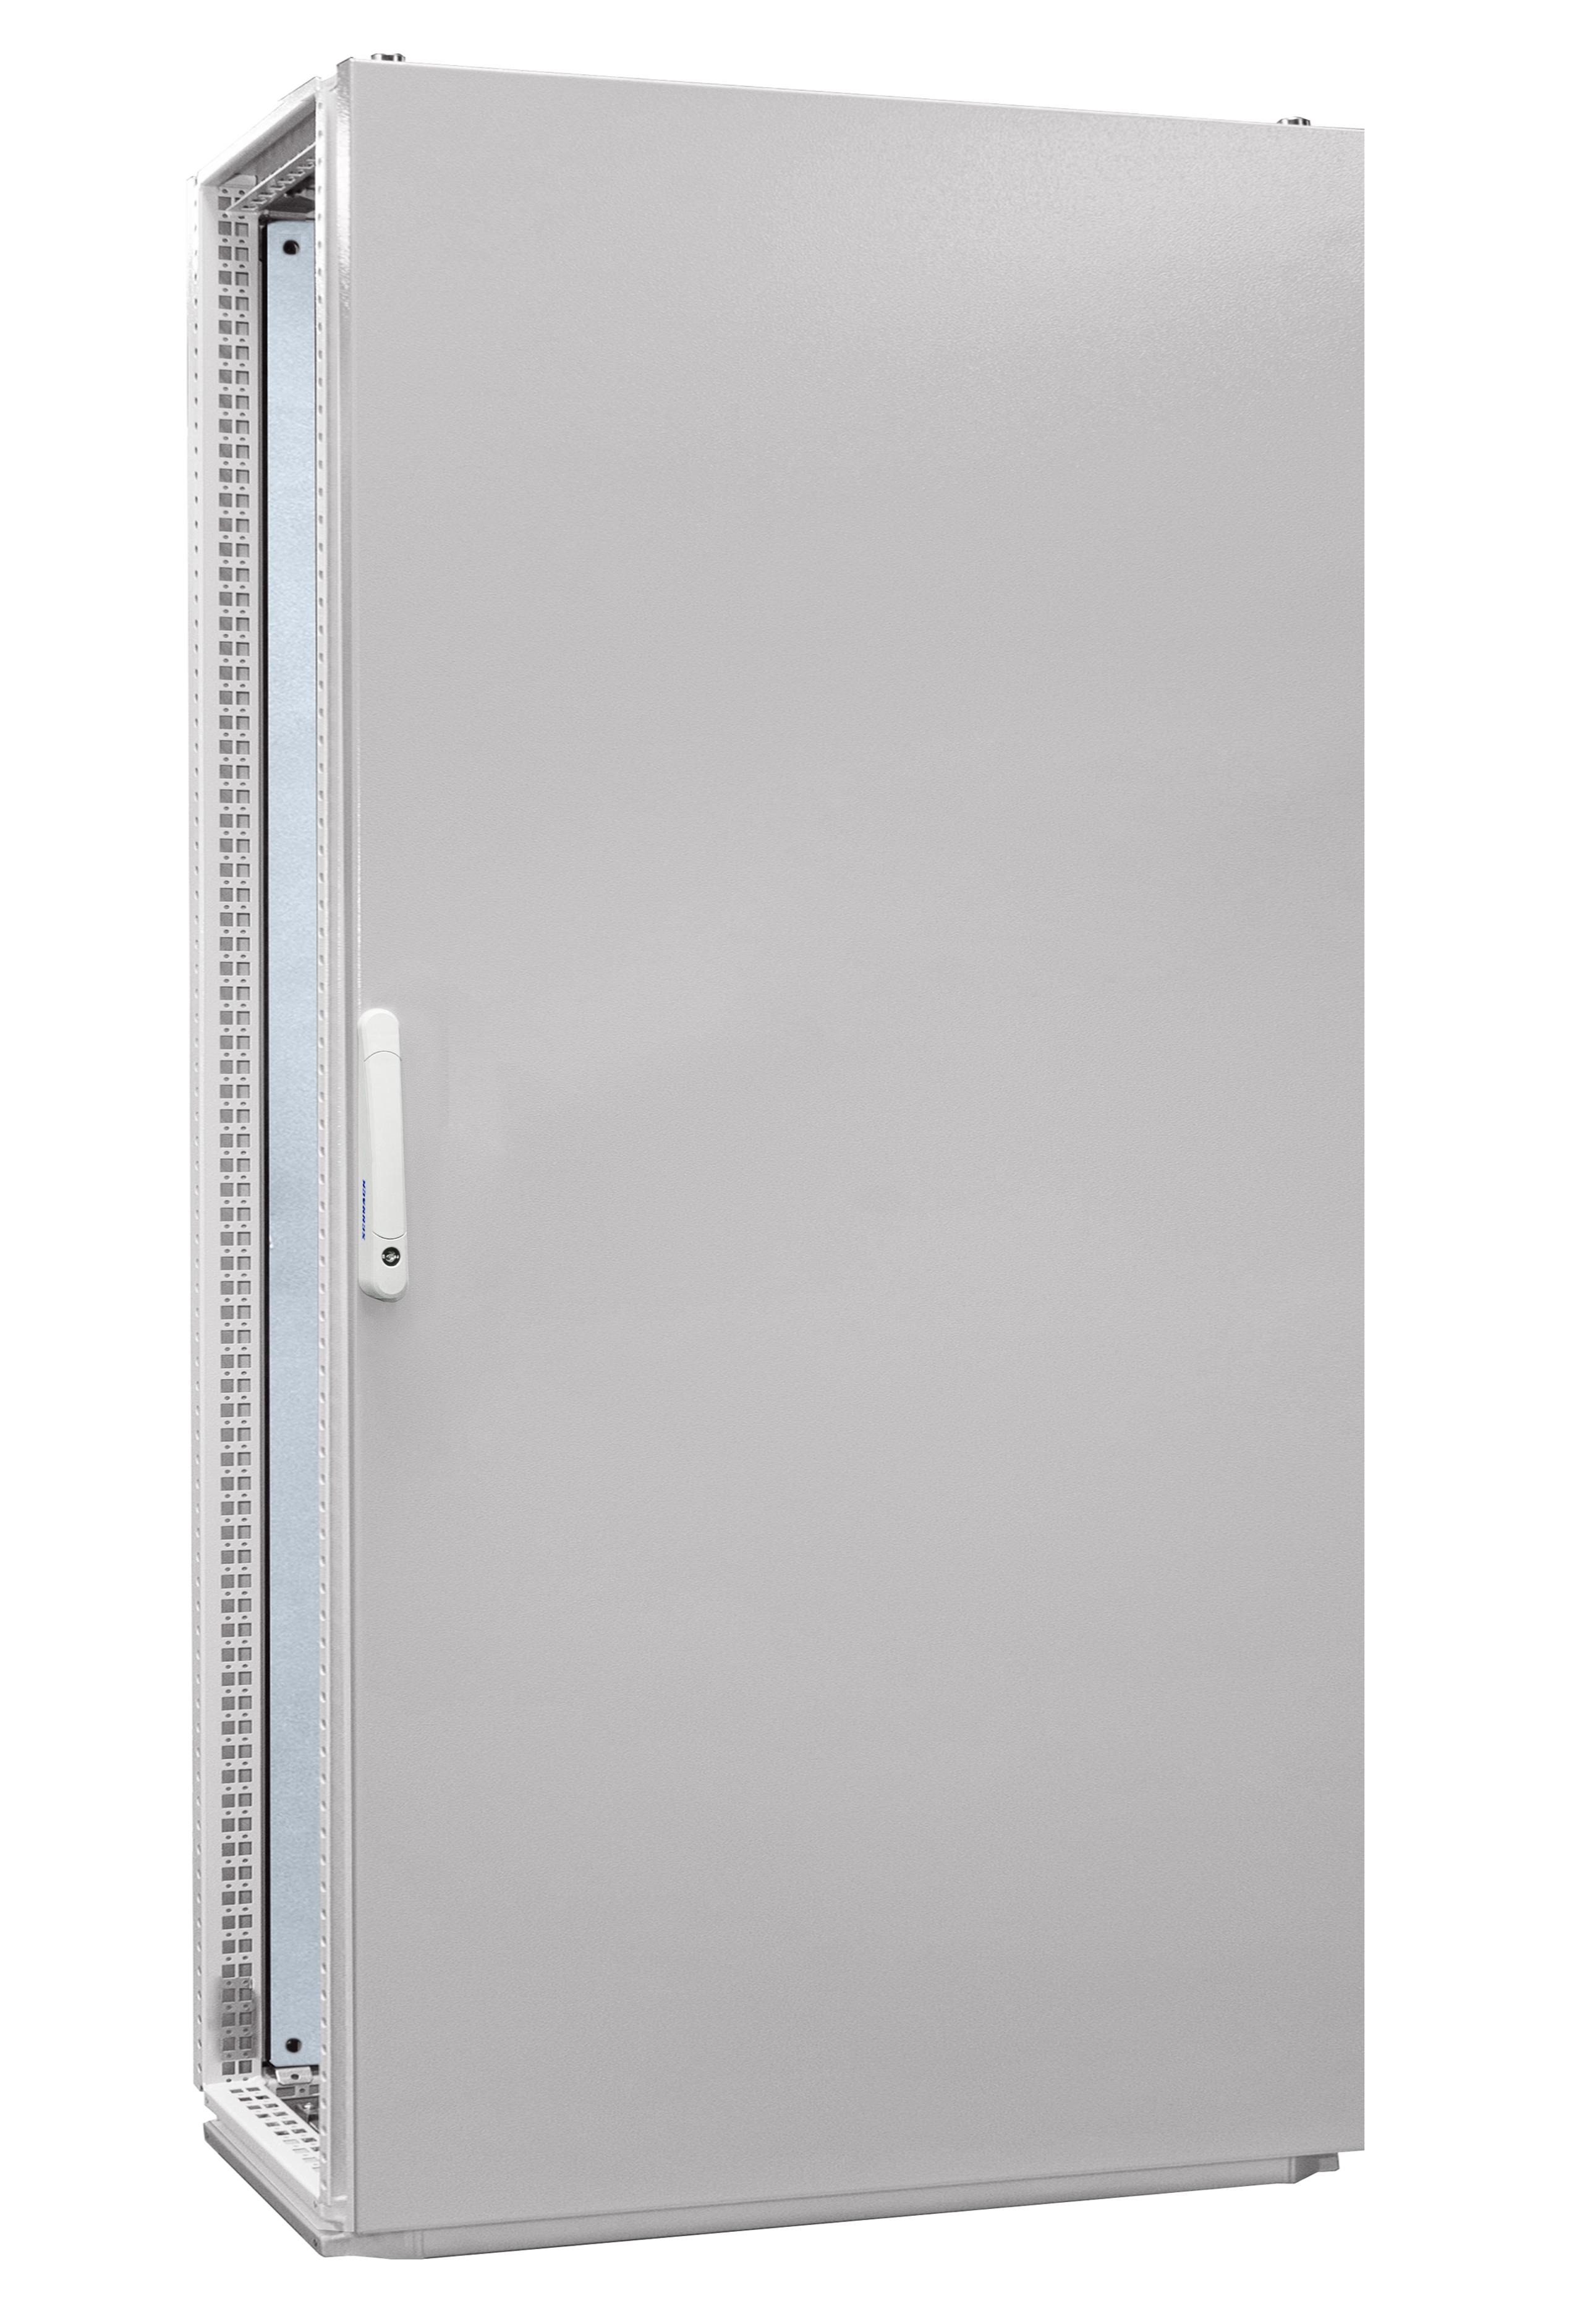 1 Stk Anreihschrank 1-Tür IP55 H=2000 B=1000 T=500mm Stahlblech AC201050--